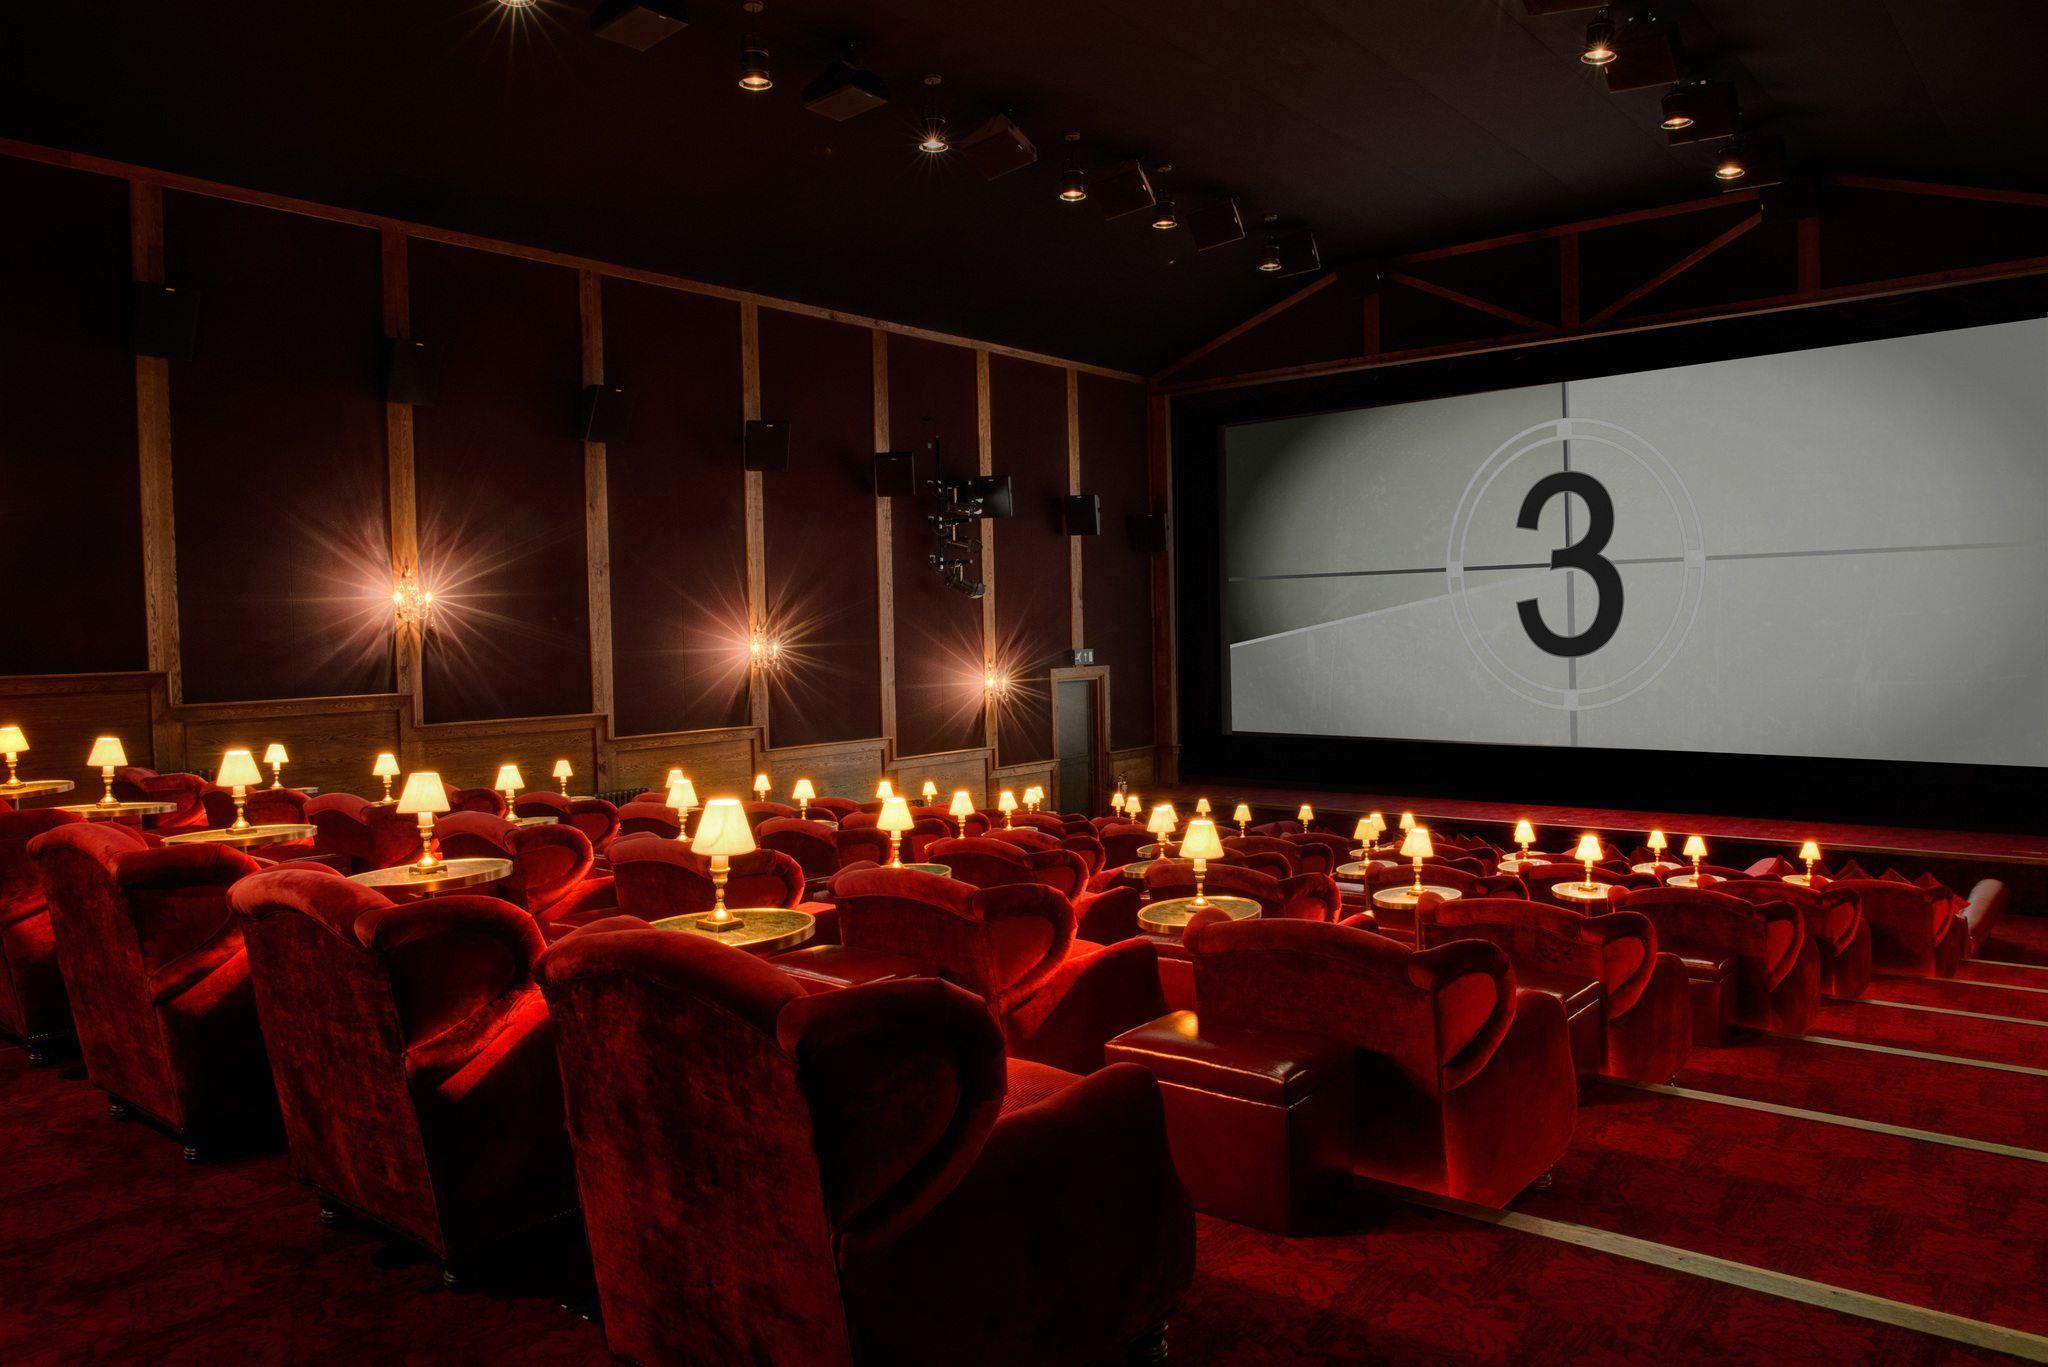 bioscoop zaal klein prive